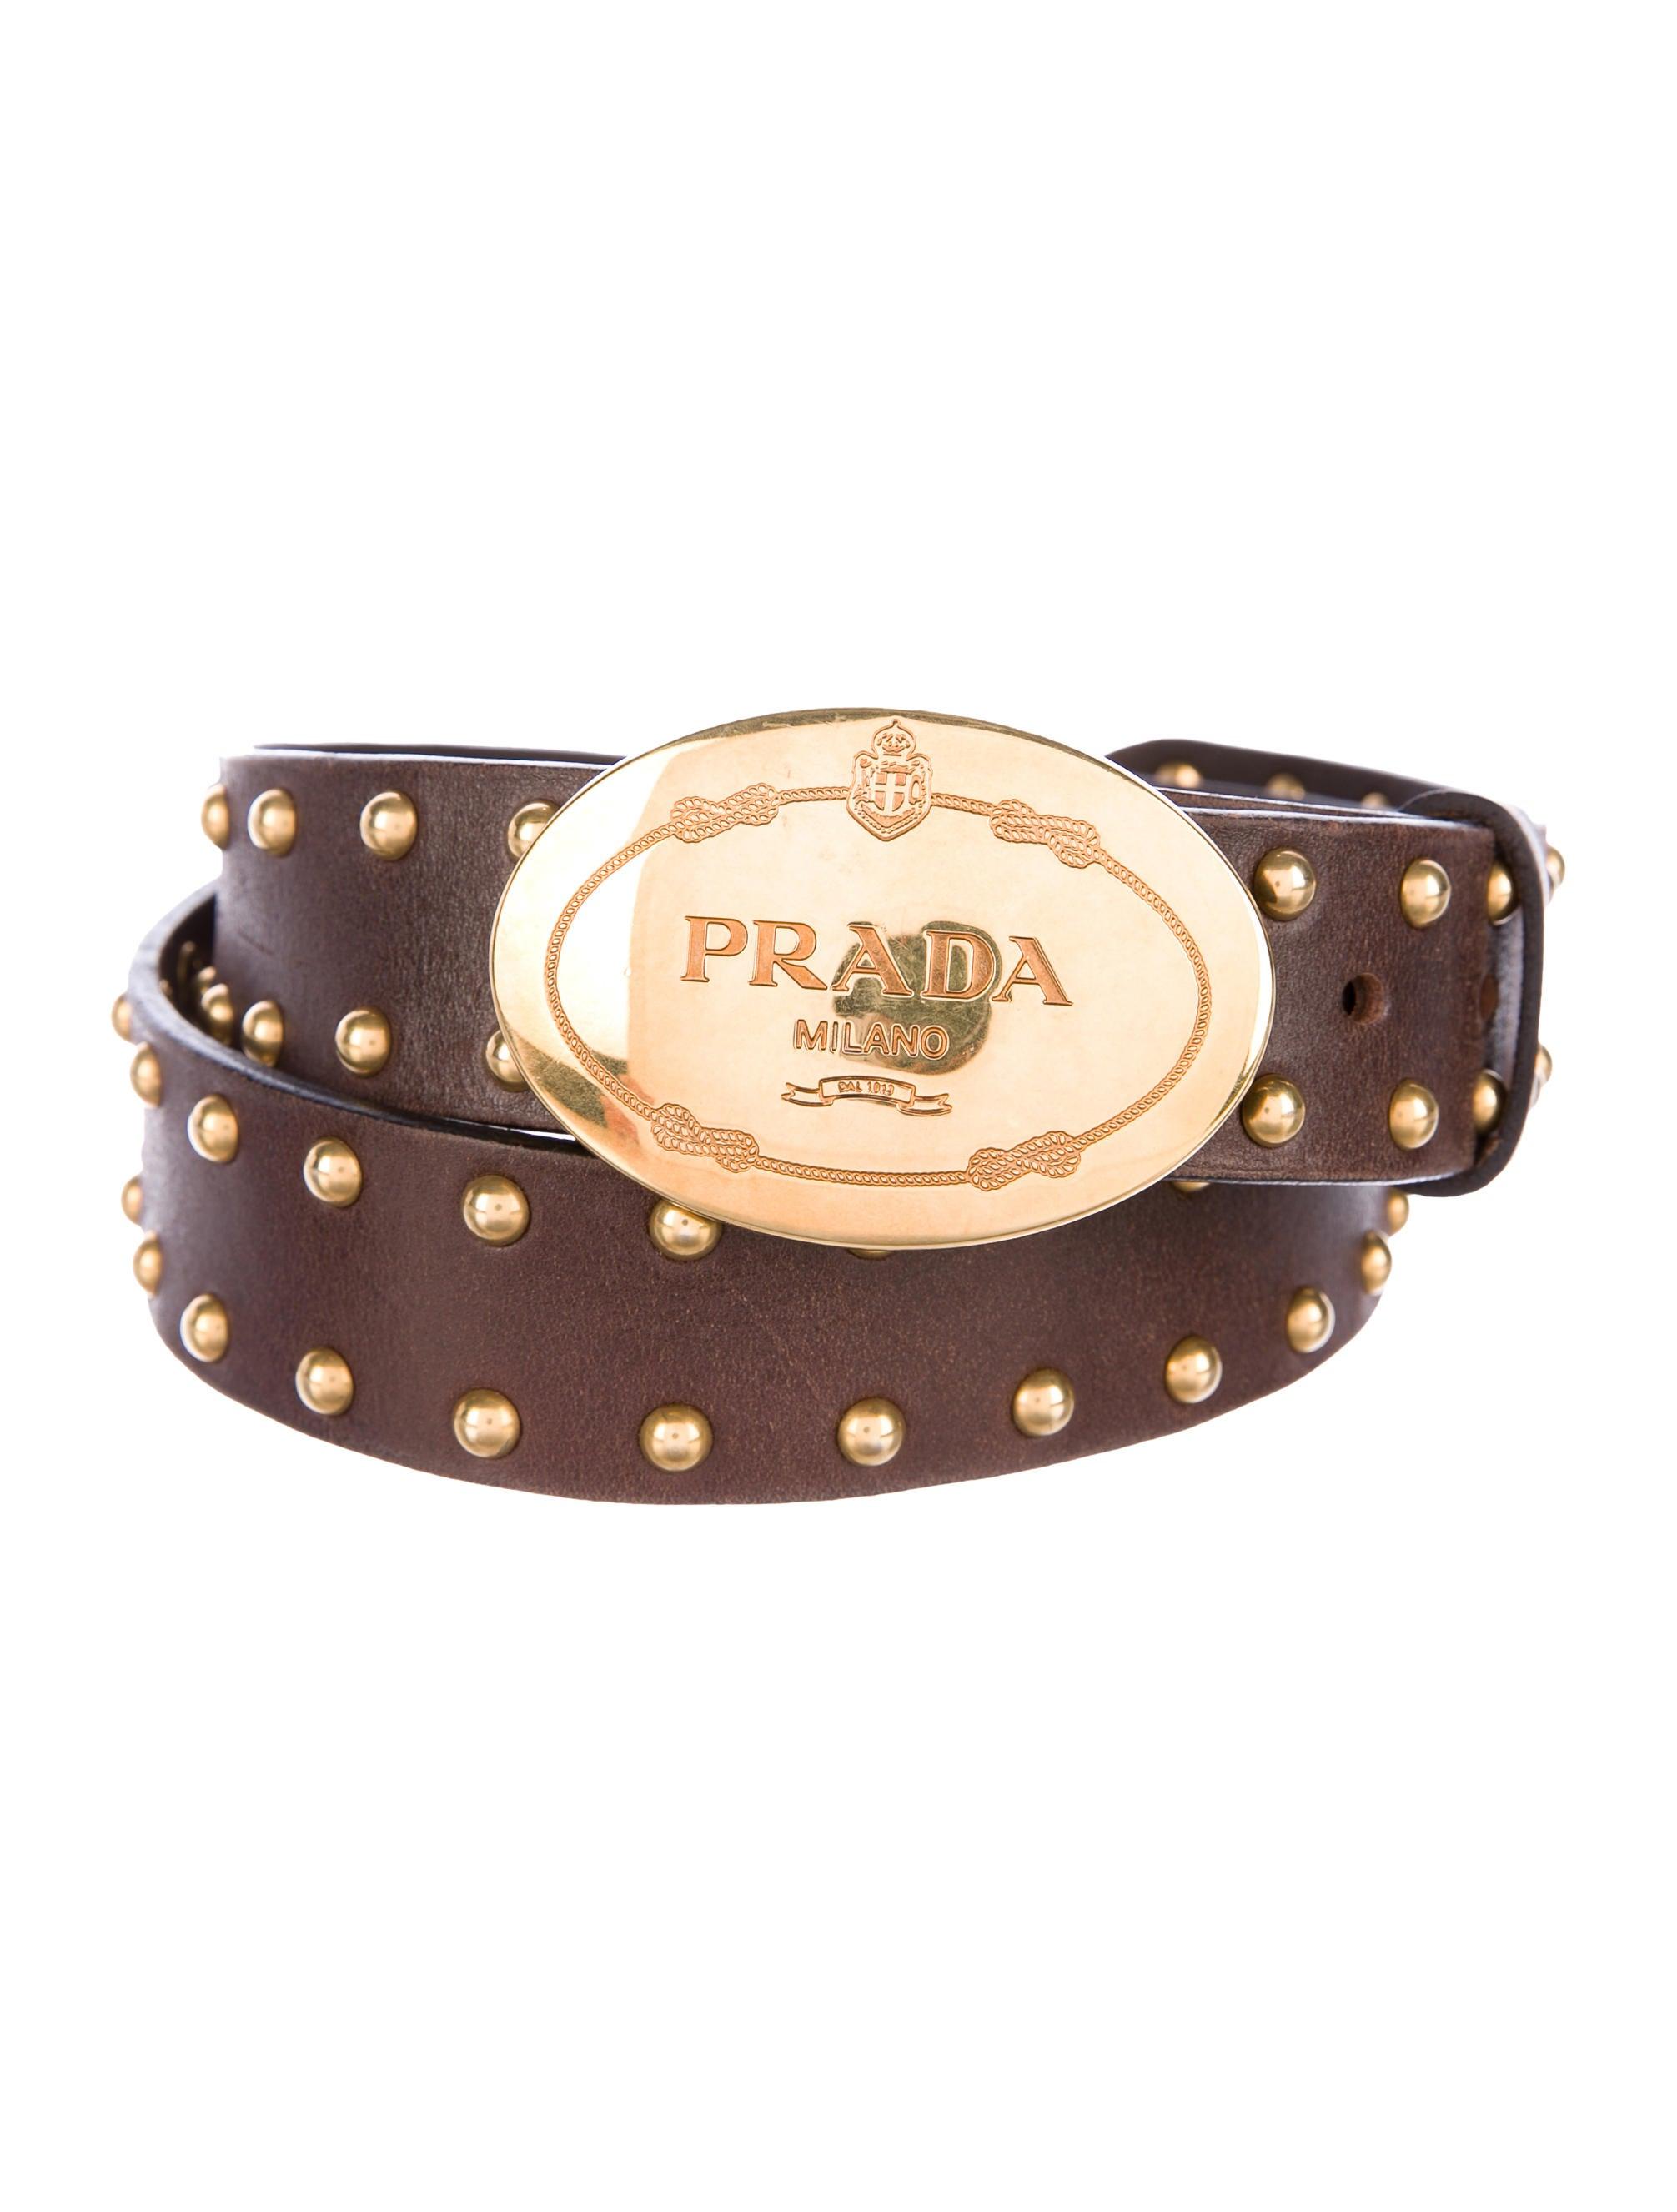 25a81862f2b123 Prada Leather Embellished Belt - Accessories - PRA180258 | The RealReal